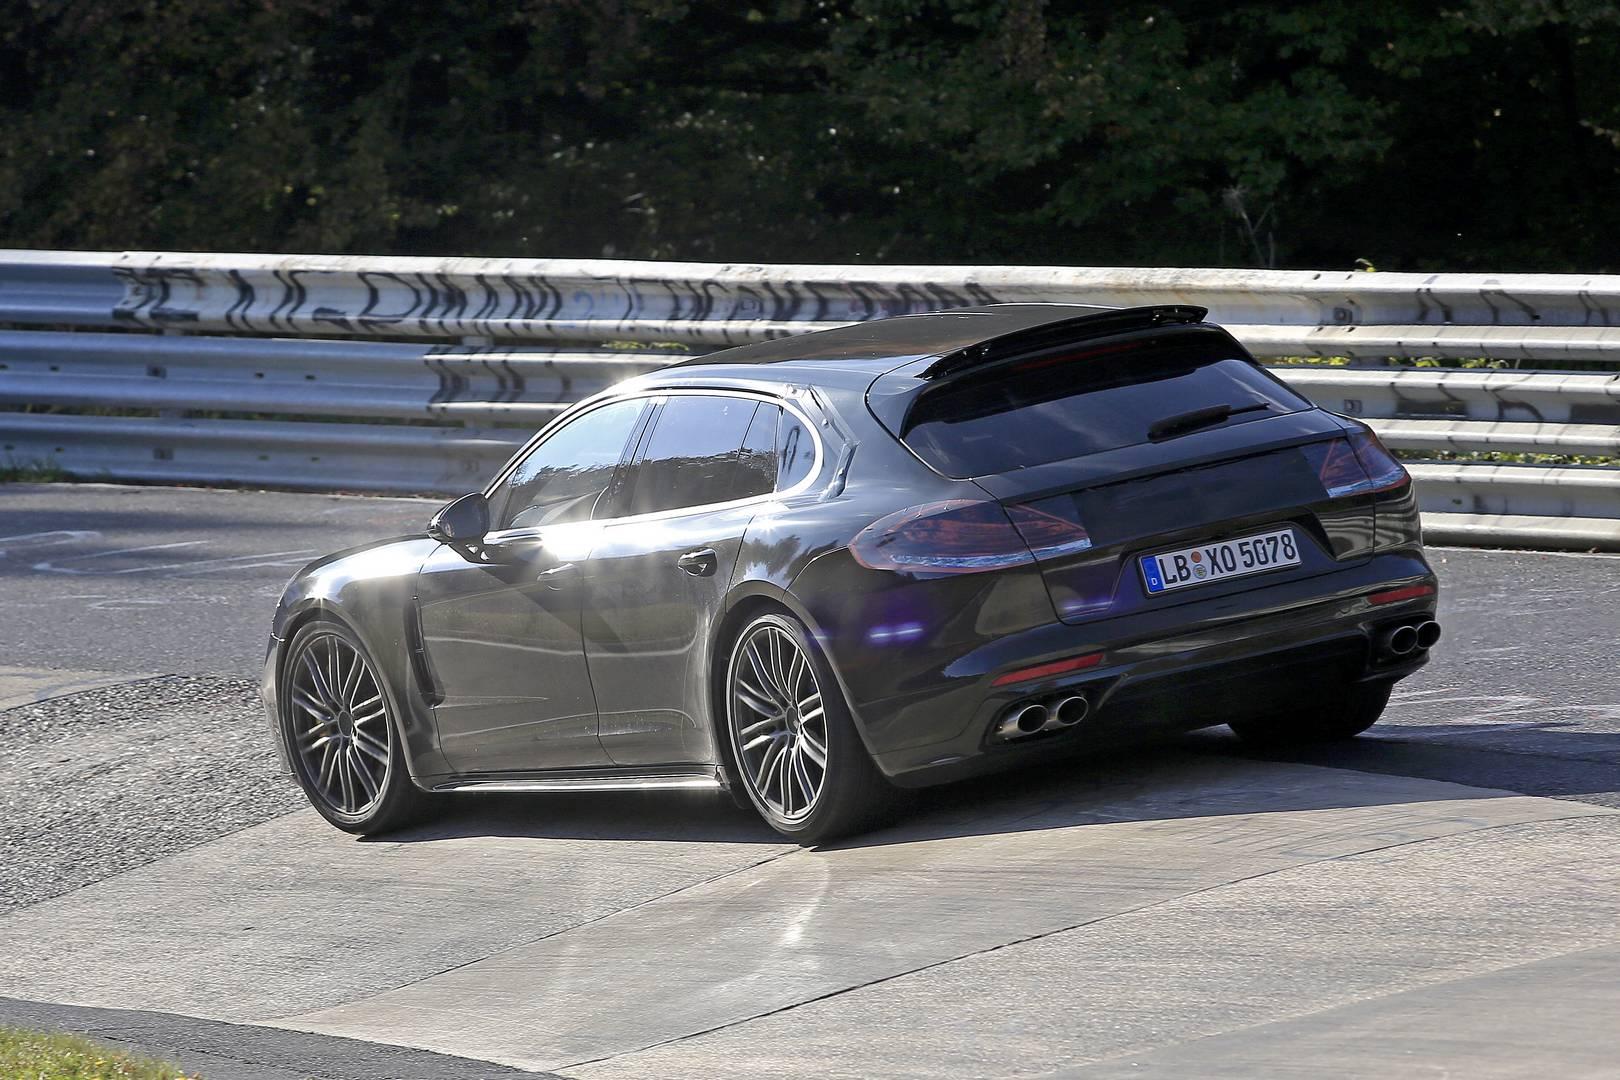 2018 porsche panamera shooting brake latest spy shots gtspirit - Tags Porsche Panamera